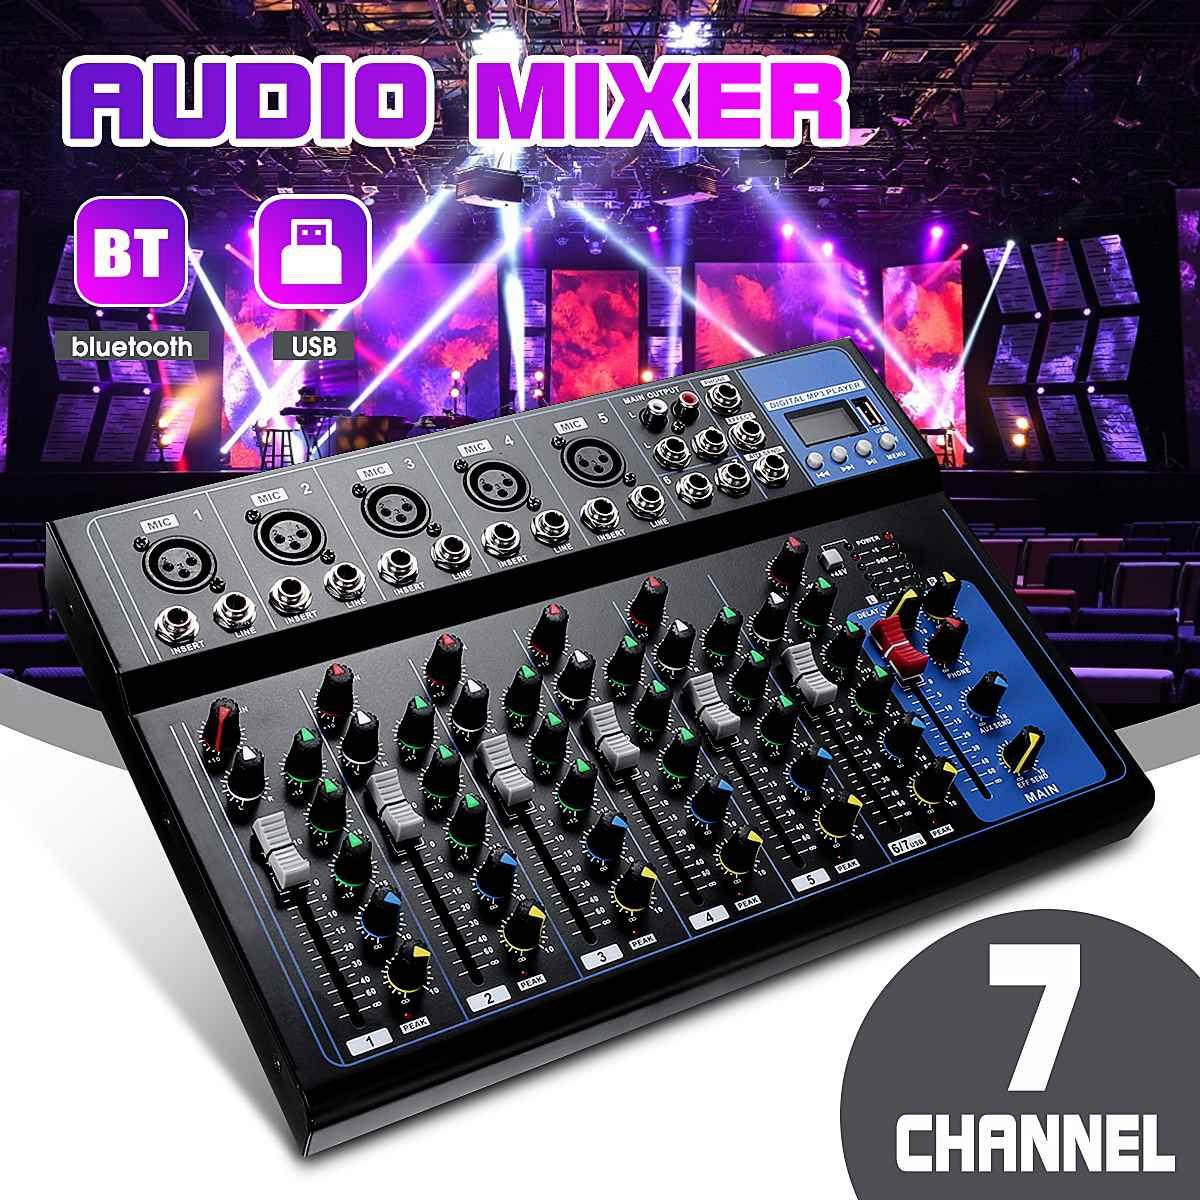 LEORY Bluetooth Audio Mixer w/USB DJ Sound Mixing Console MP3 Jack 7 Channel Karaoke 48V Amplifier Karaoke KTV Match Party